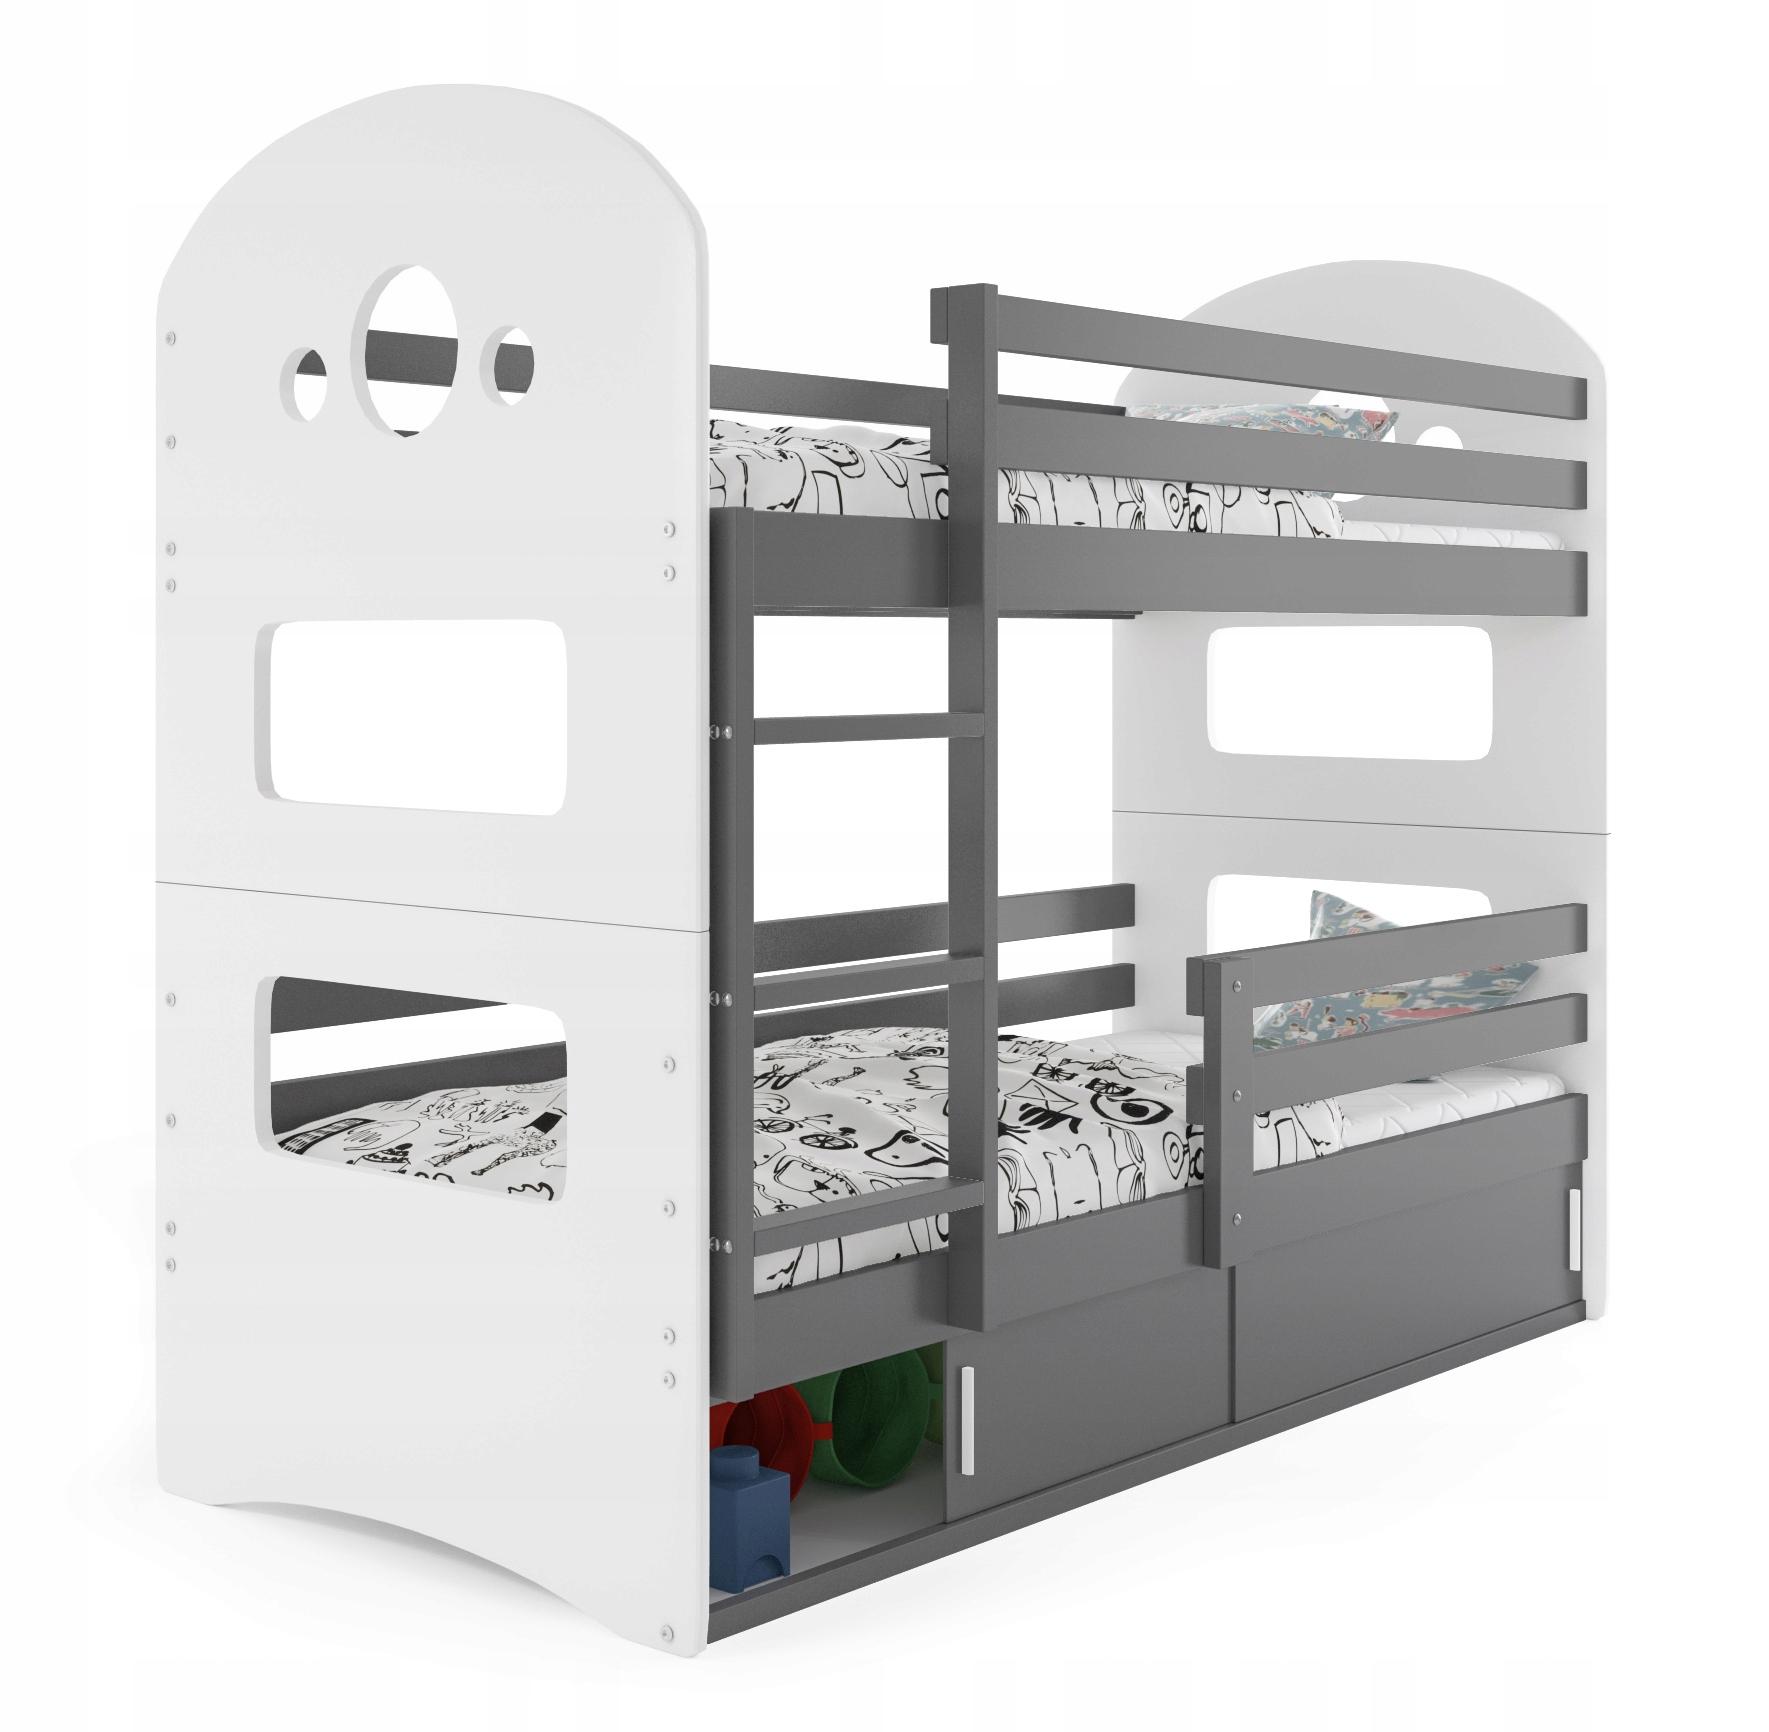 двухъярусная кровать Доминик 190x80 + каркас+ матрас